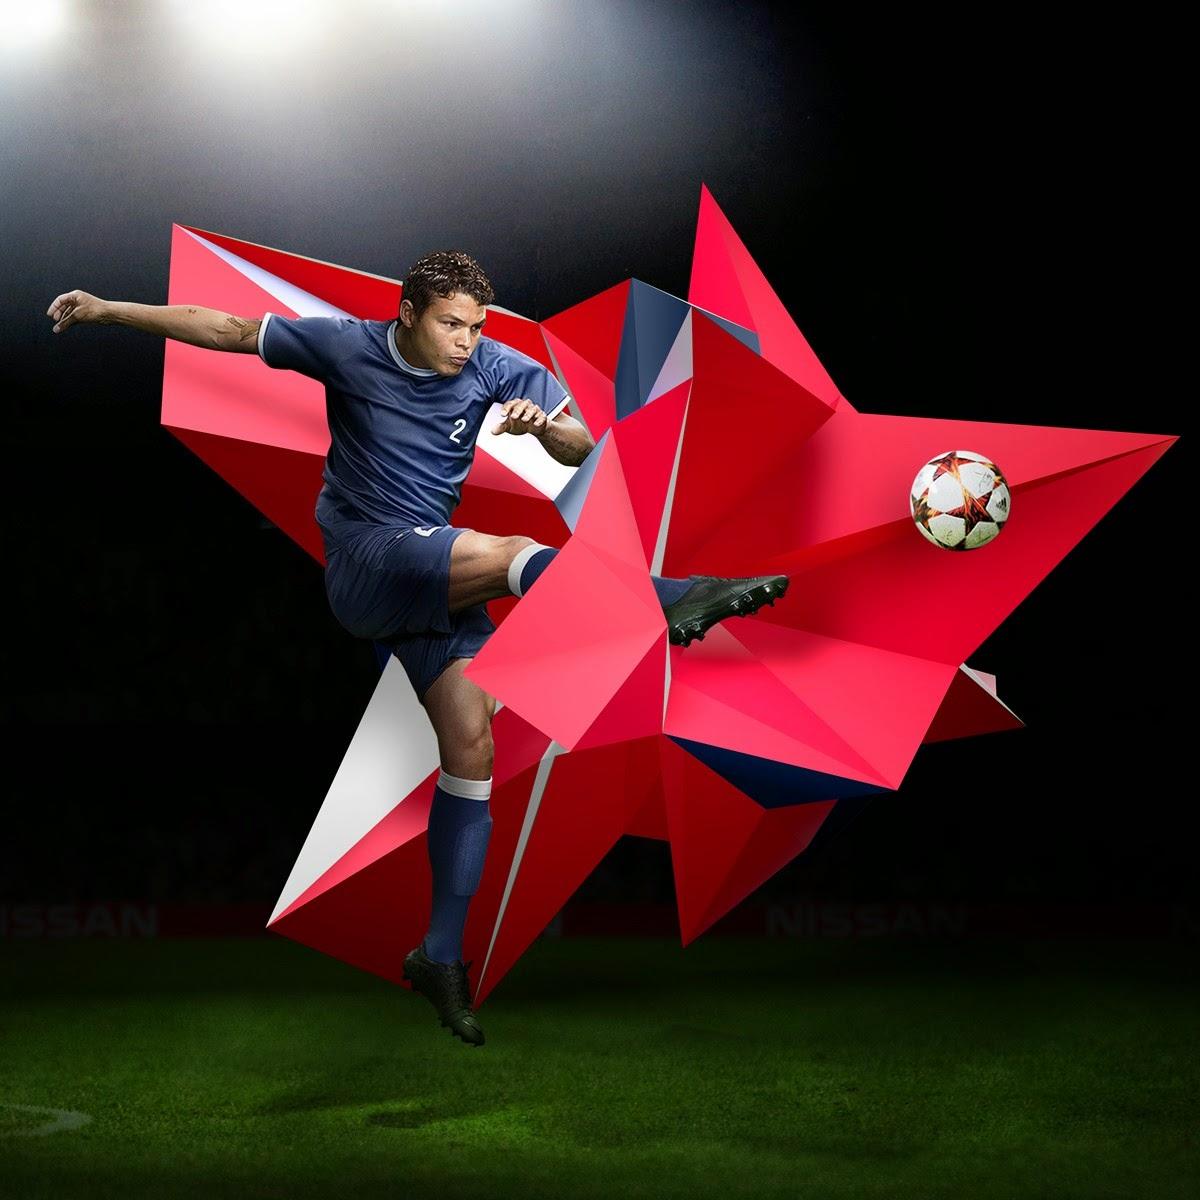 NISSAN: Αποκλειστικότητα με το Γκολ της Εβδομάδας για το UEFA CHAMPIONS LEAGUE